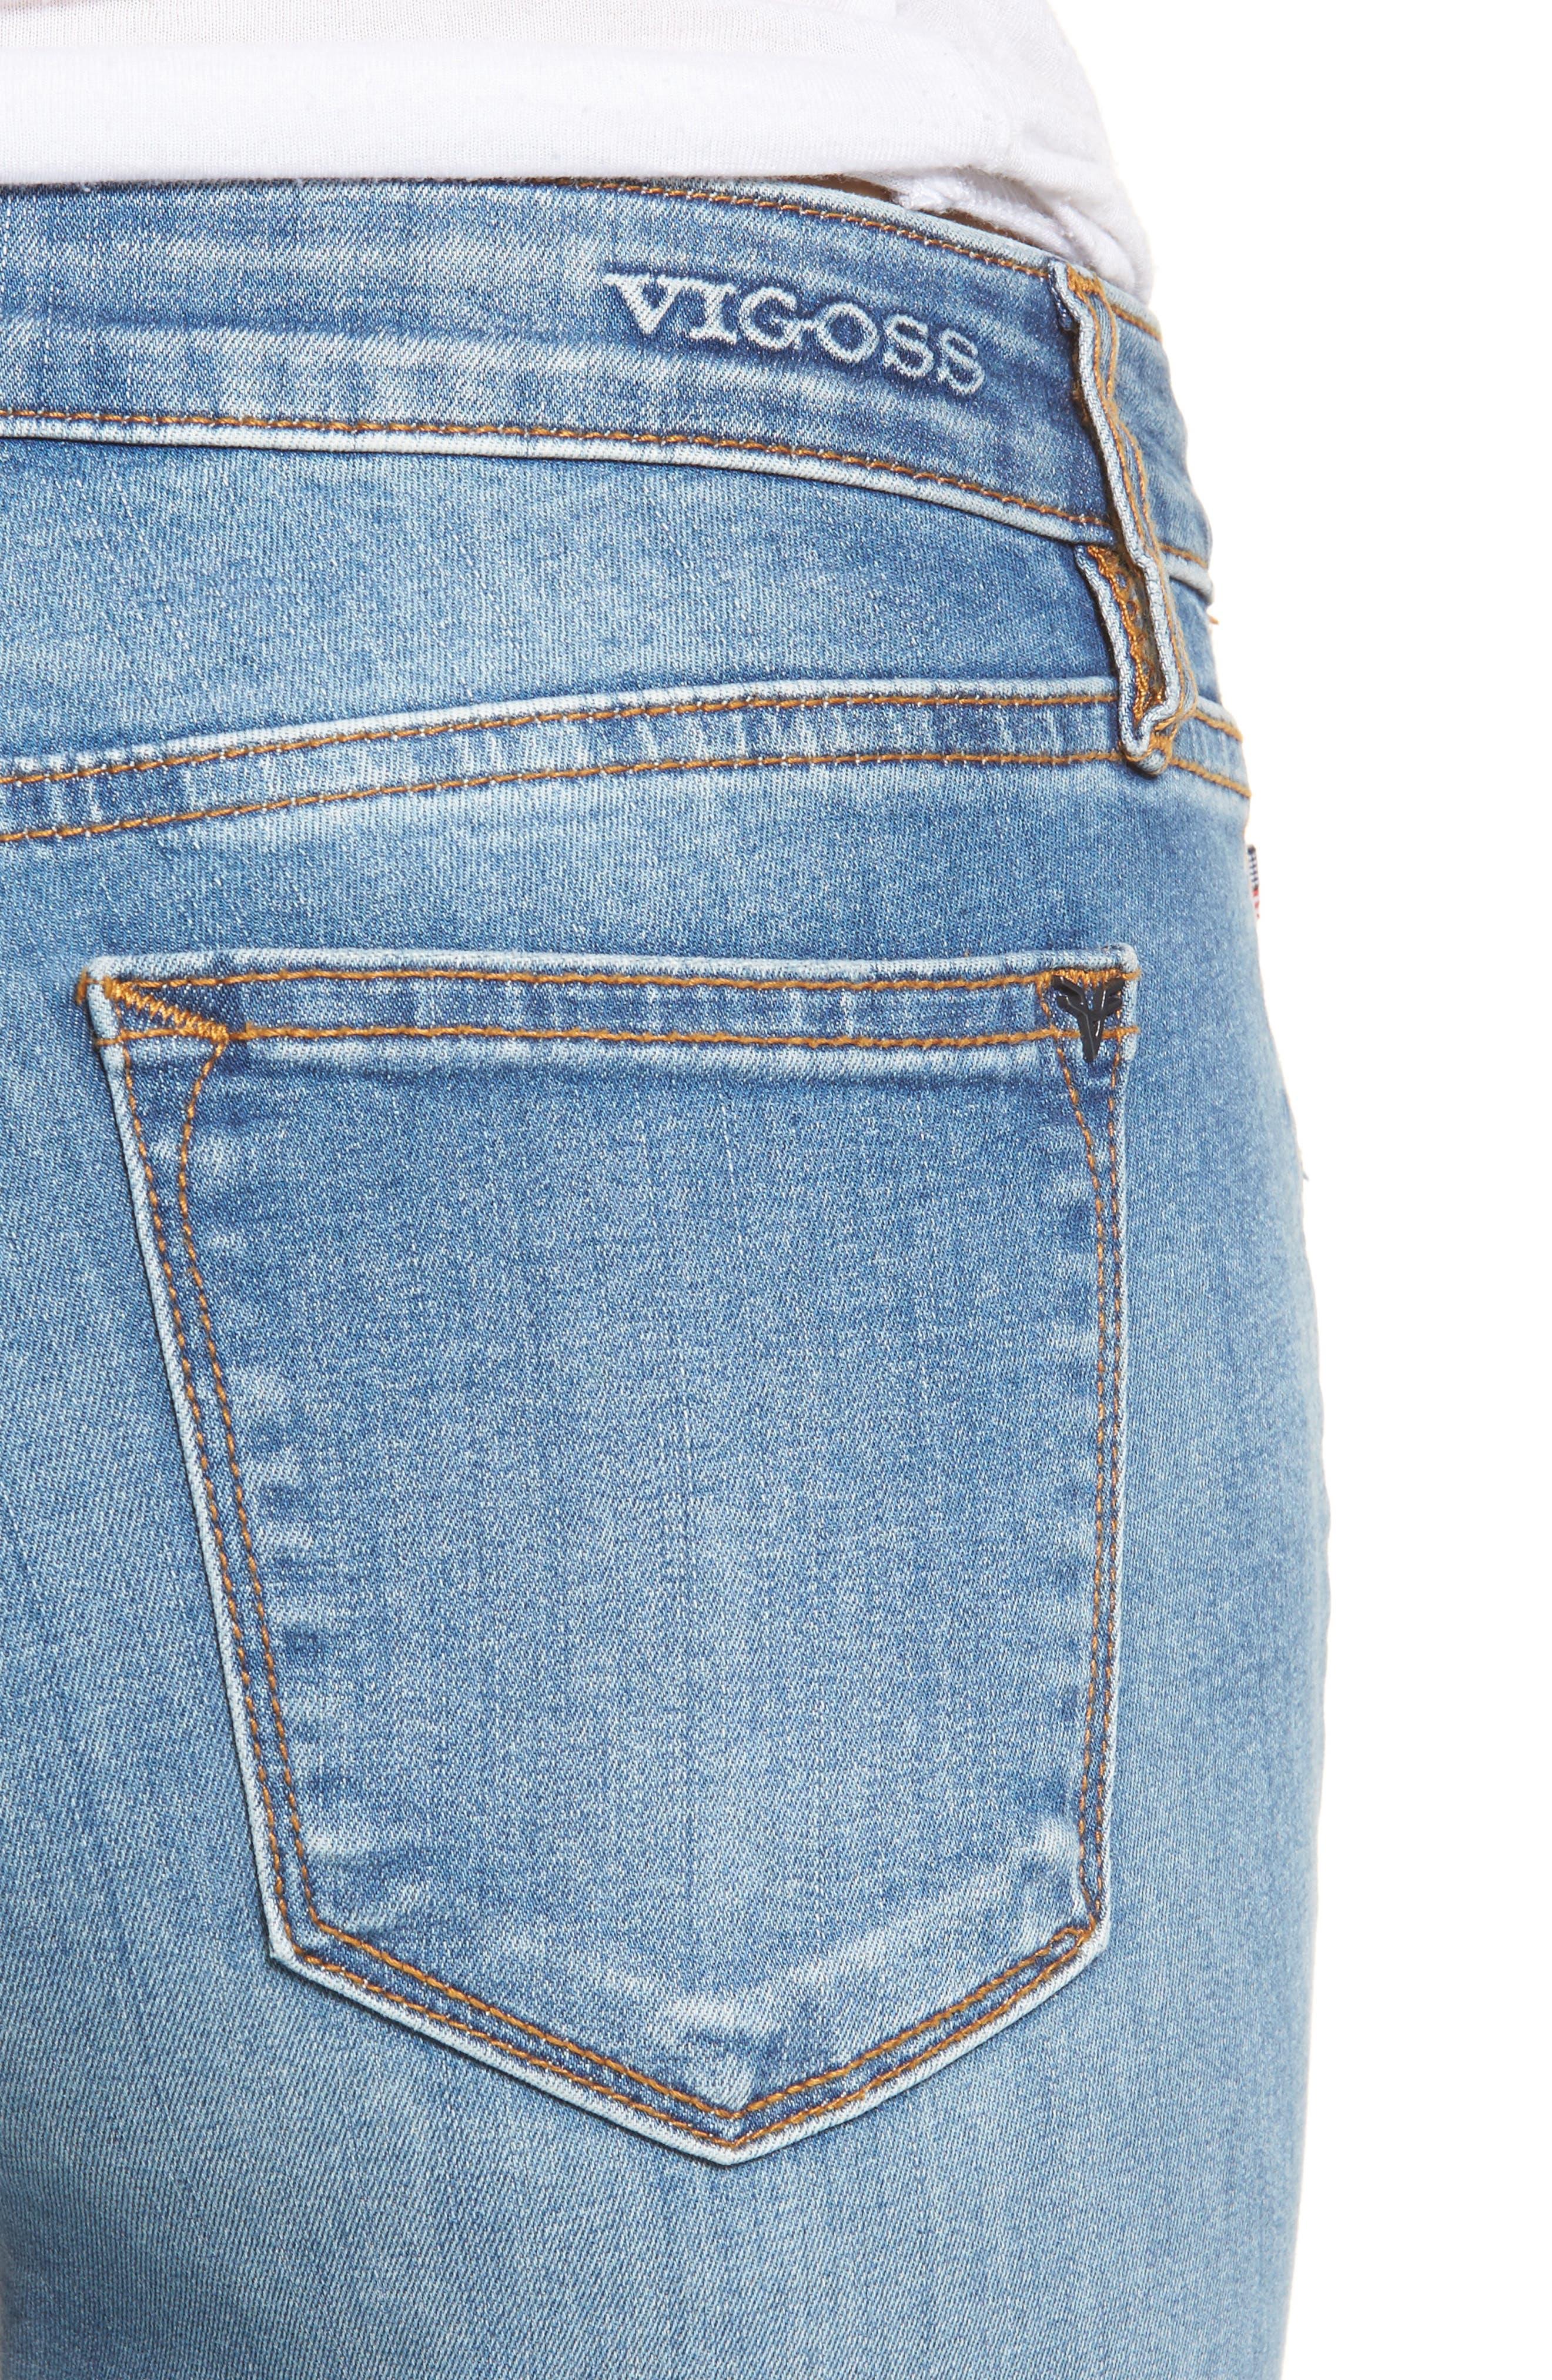 Edie Distressed Skinny Jeans,                             Alternate thumbnail 4, color,                             461